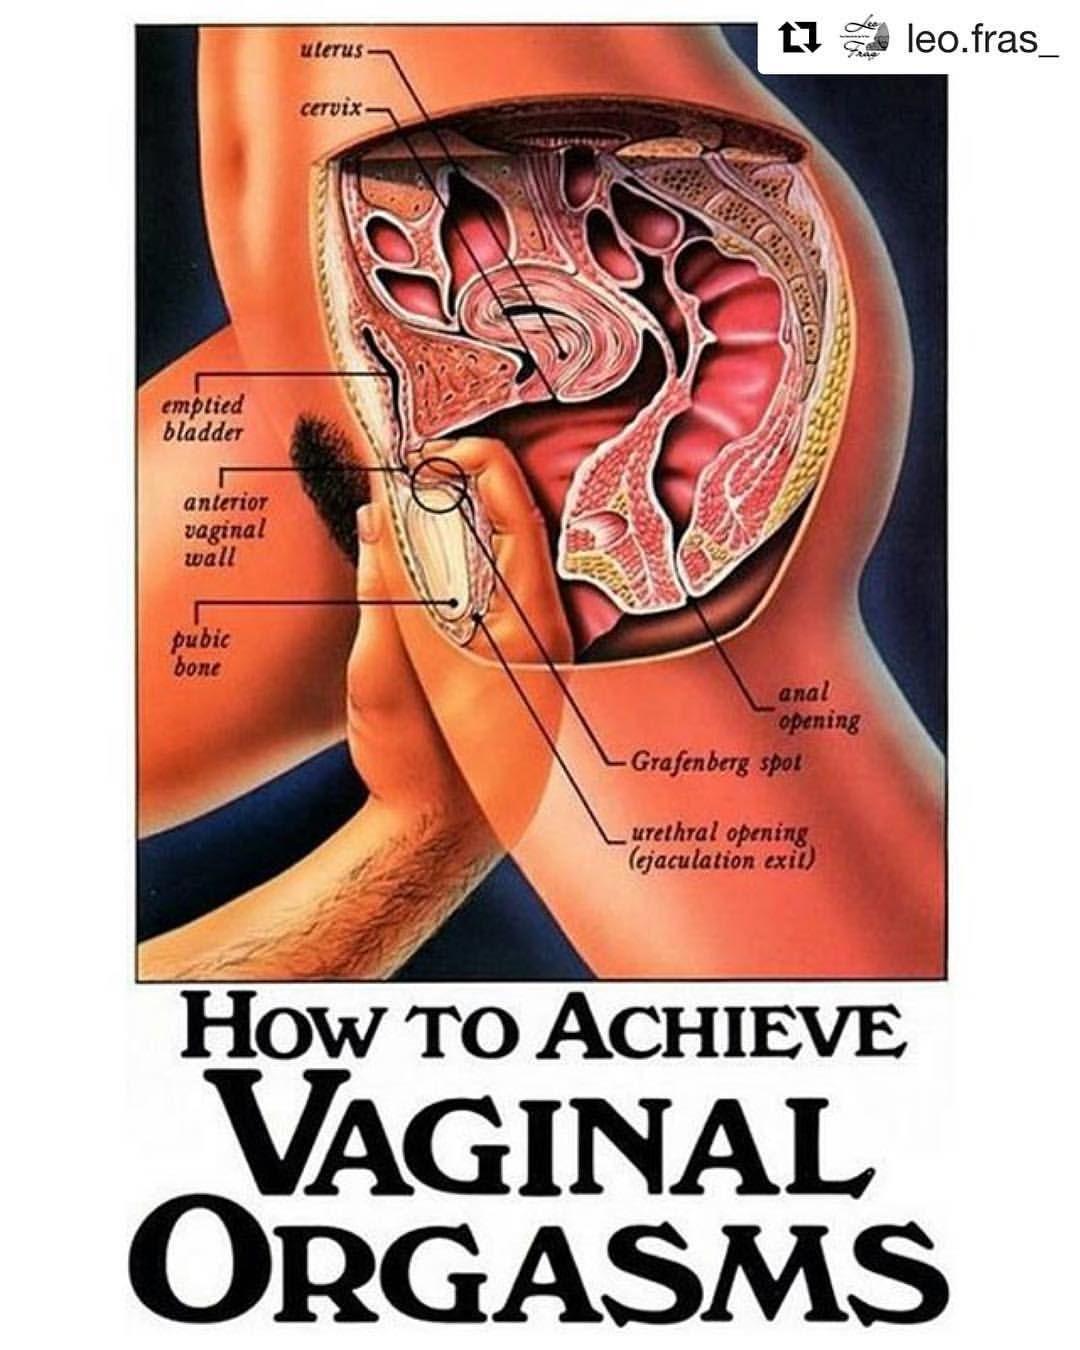 to achieve a vaginal orgasm